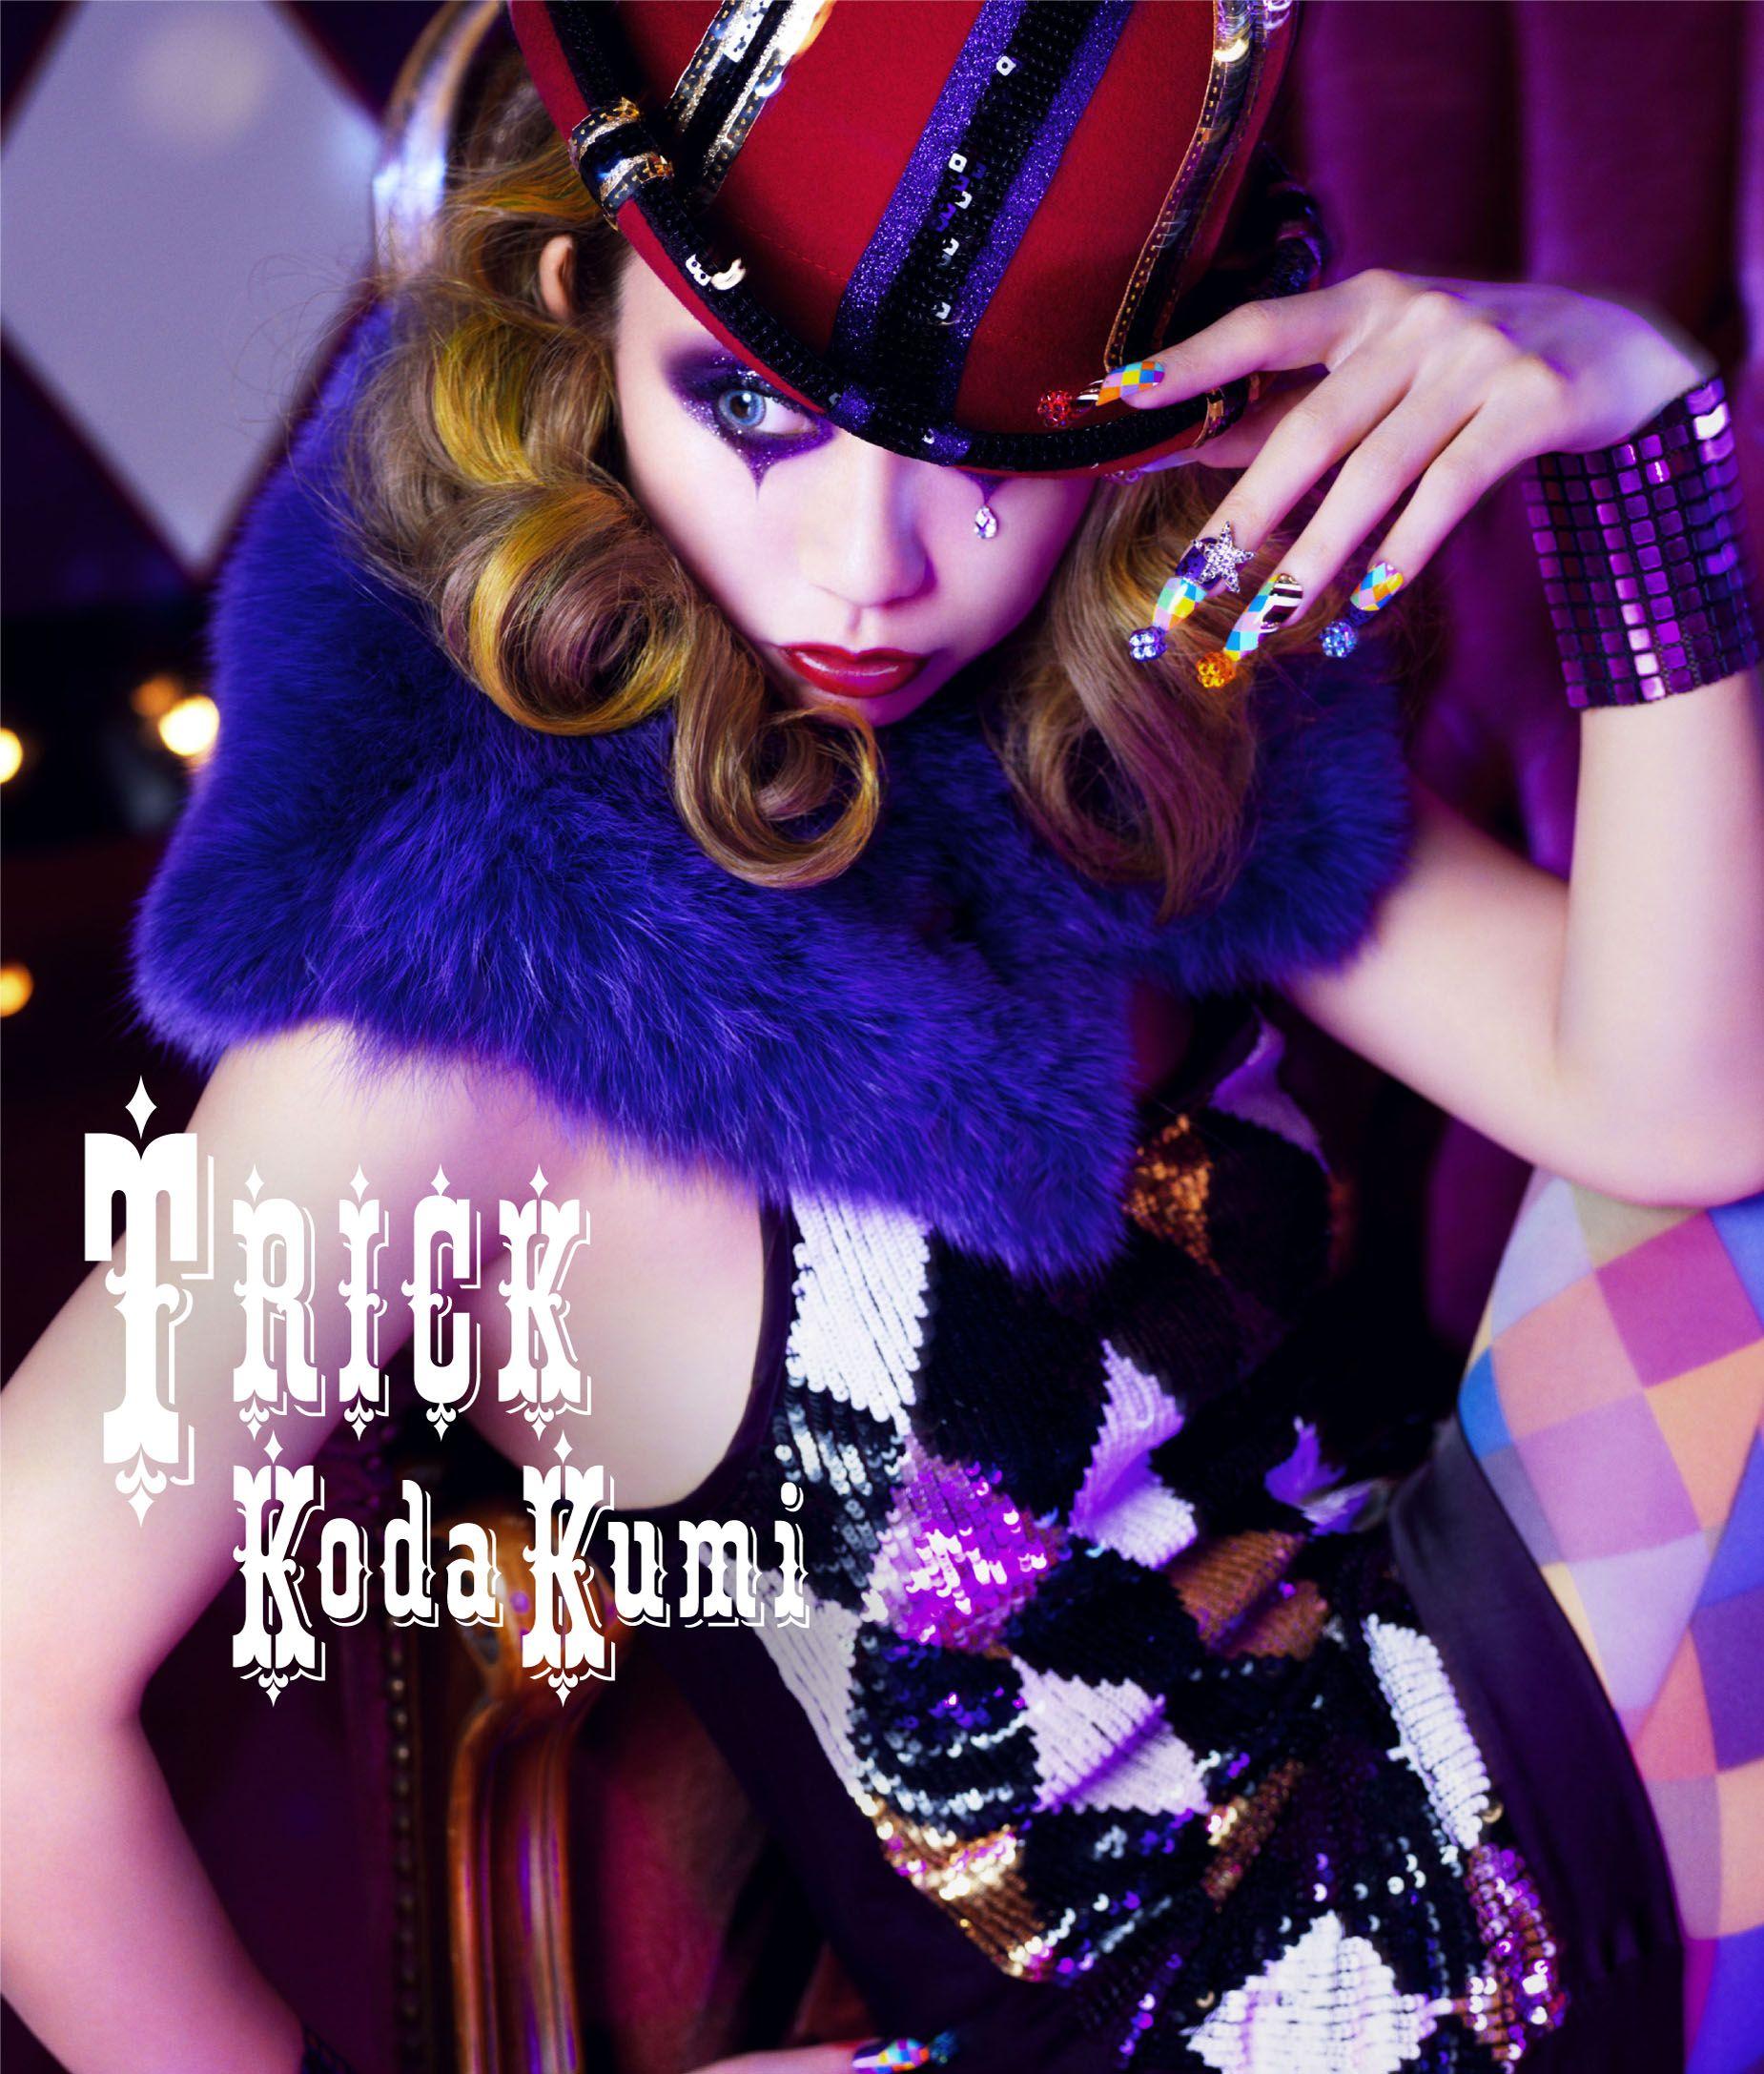 Kumi Koda - Trick album cover